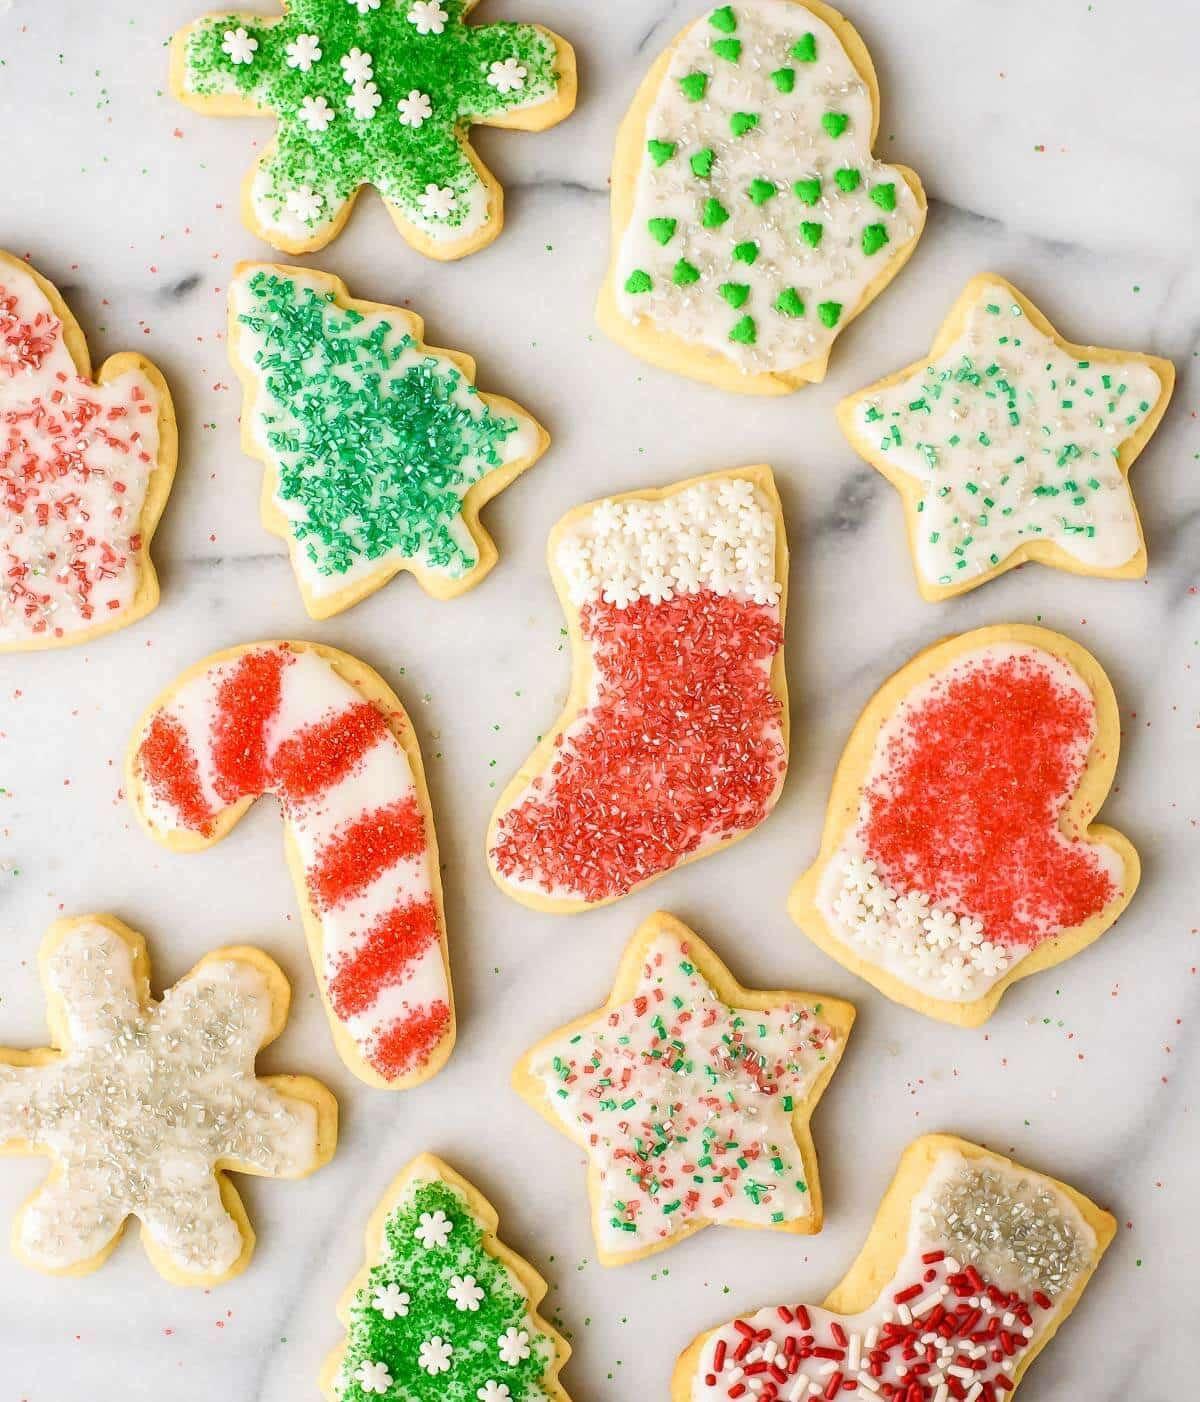 Recipes For Christmas Sugar Cookies  Perfect Cream Cheese Sugar Cookies